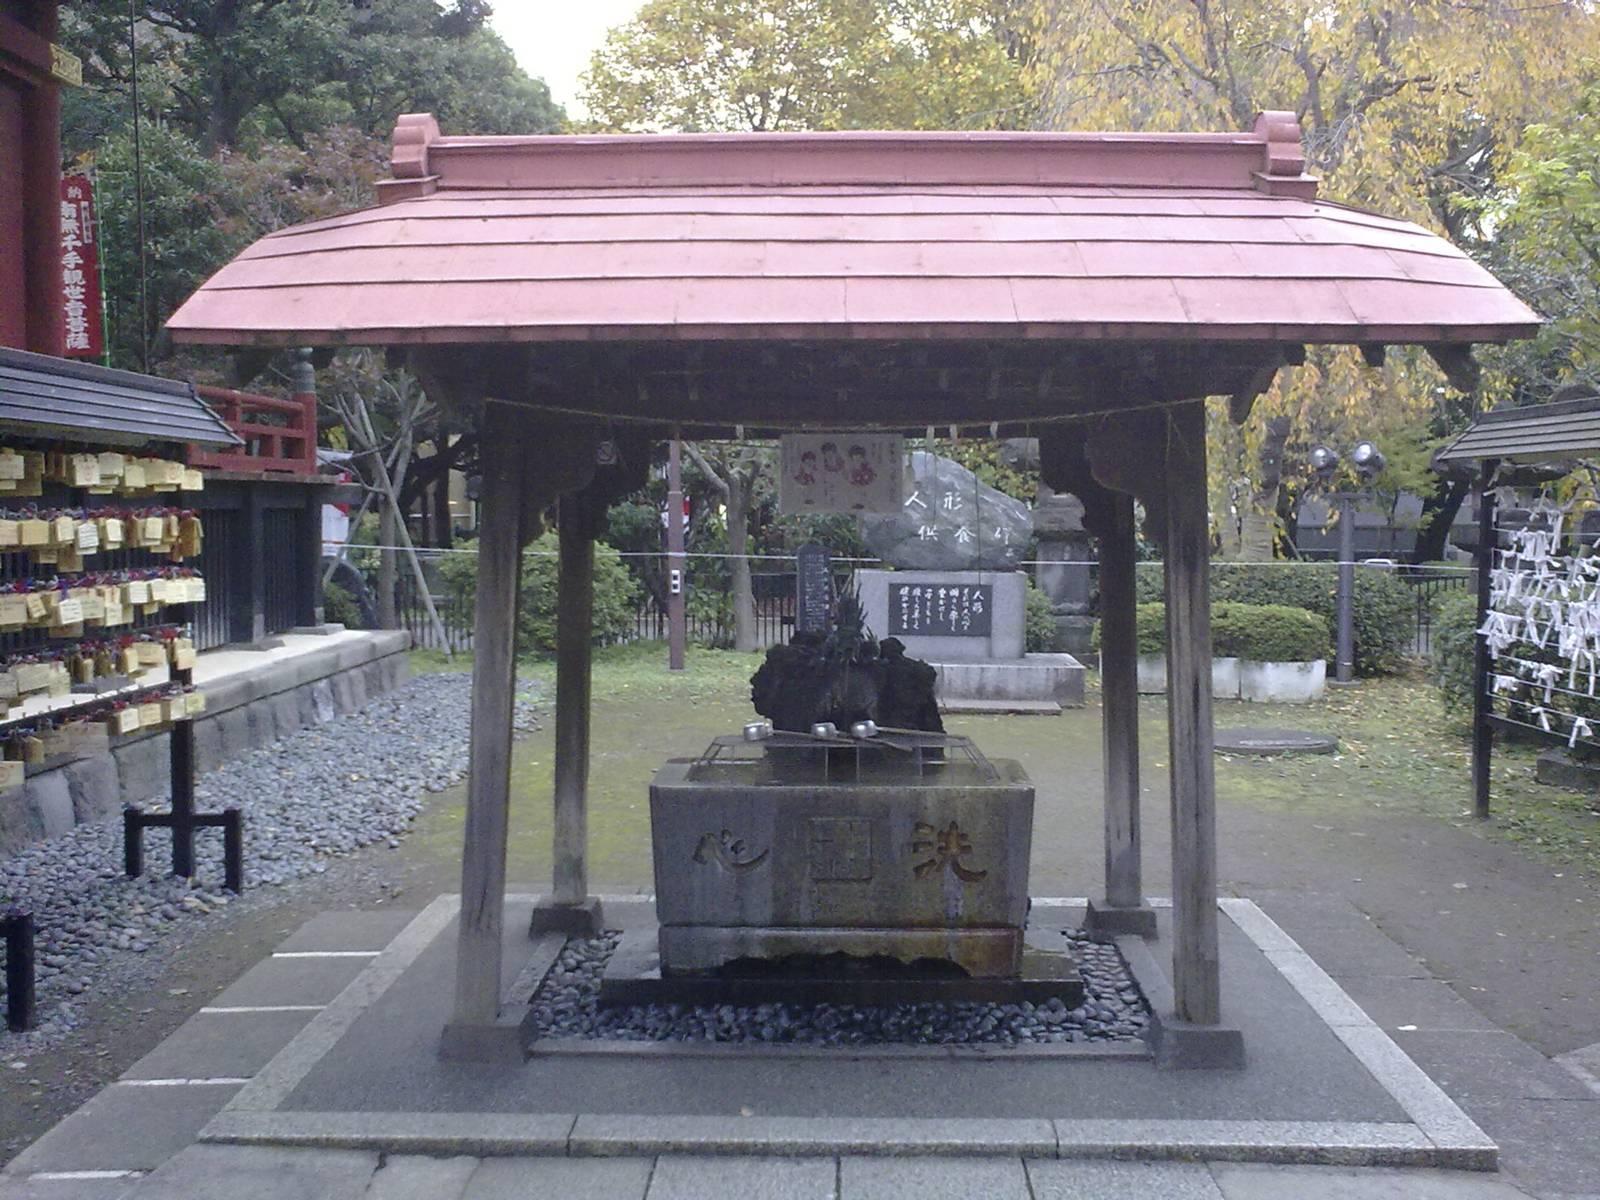 Giappone-tempio-acqua-santa-shrine-buddista